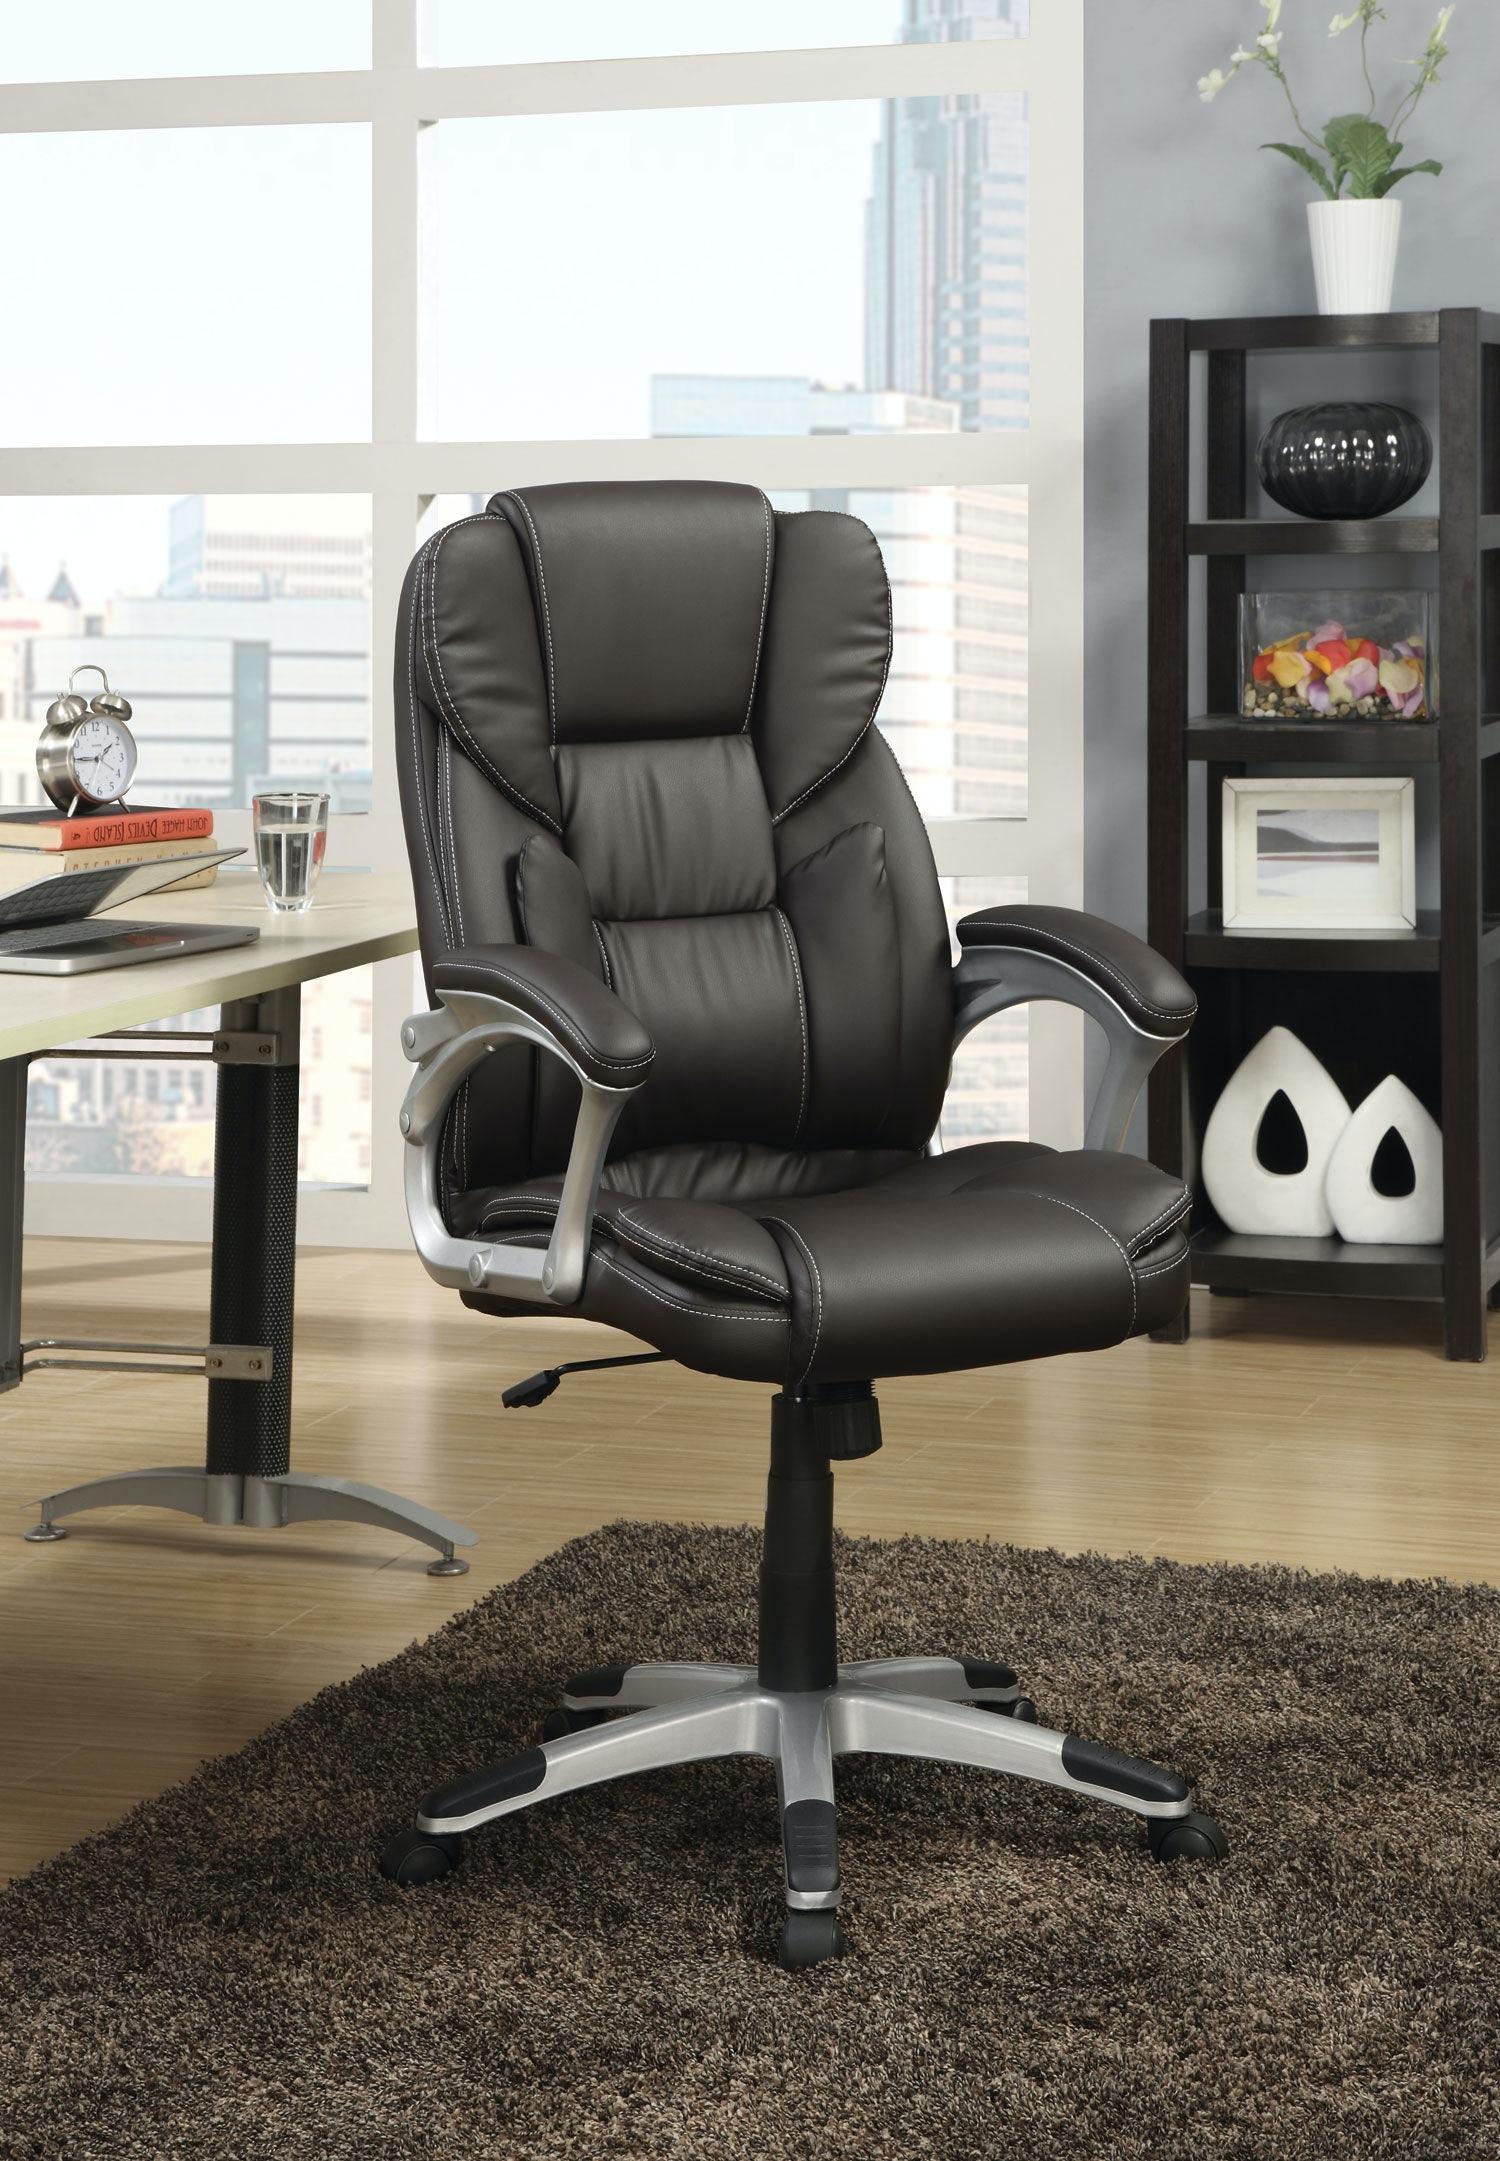 office chairs phoenix arizona chair japan coaster home 800045 furniture plus